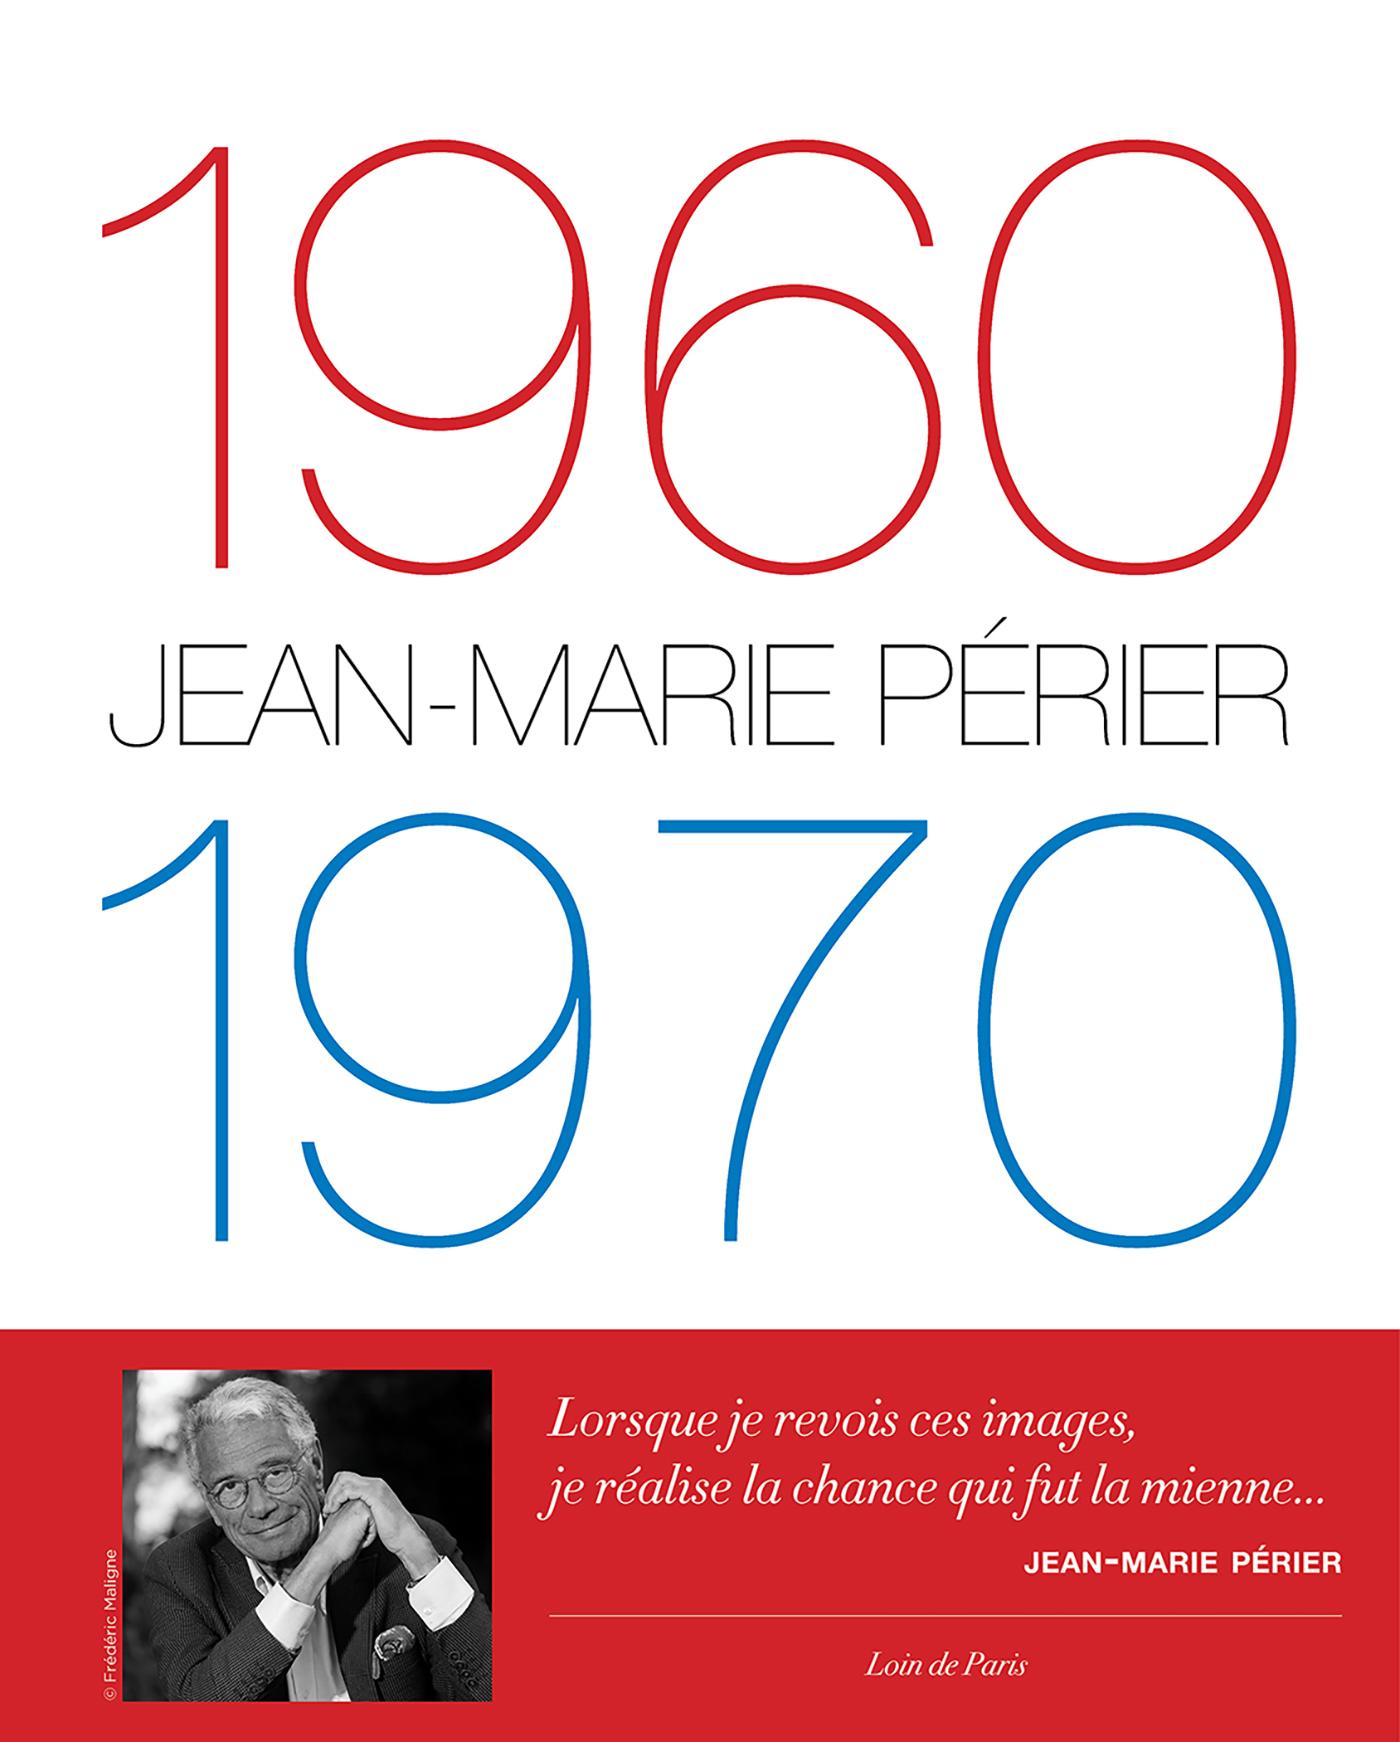 1960-1970 - JEAN-MARIE PERIER